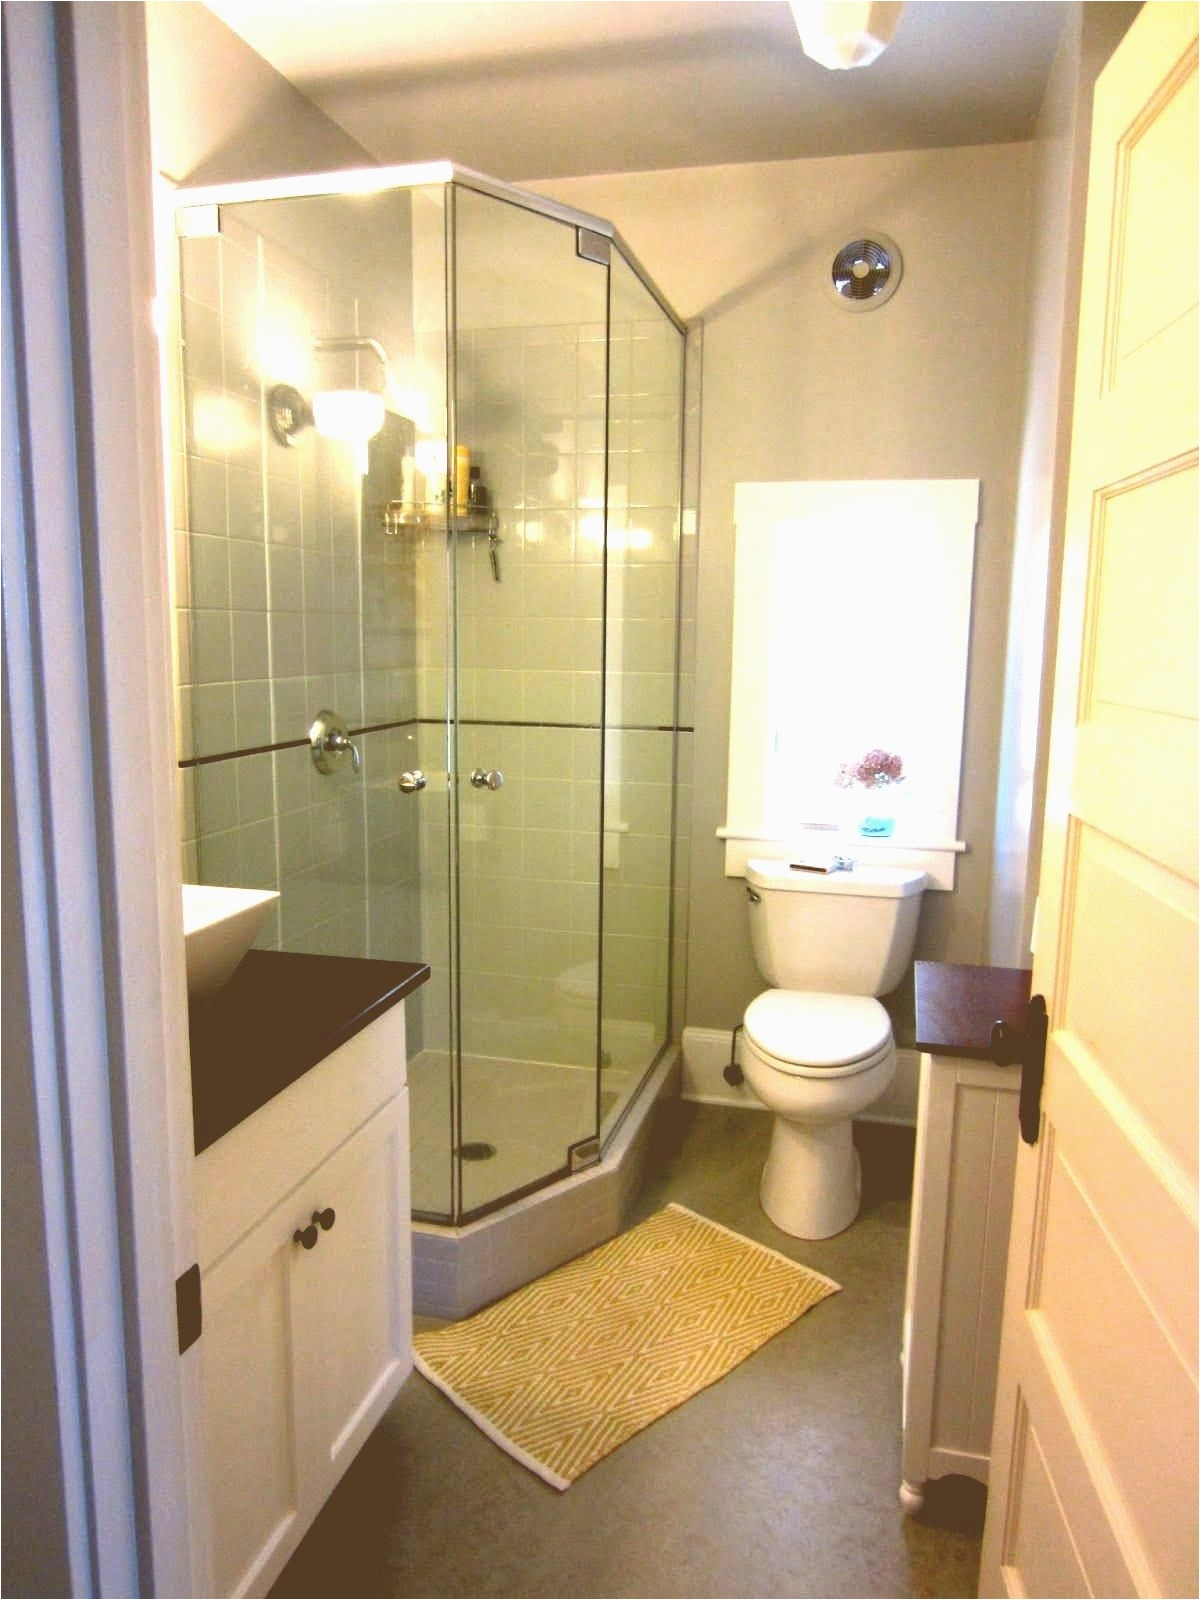 Corridor Bathroom Design Ideas New 31 Luxury 5x5 Bathroom Layout